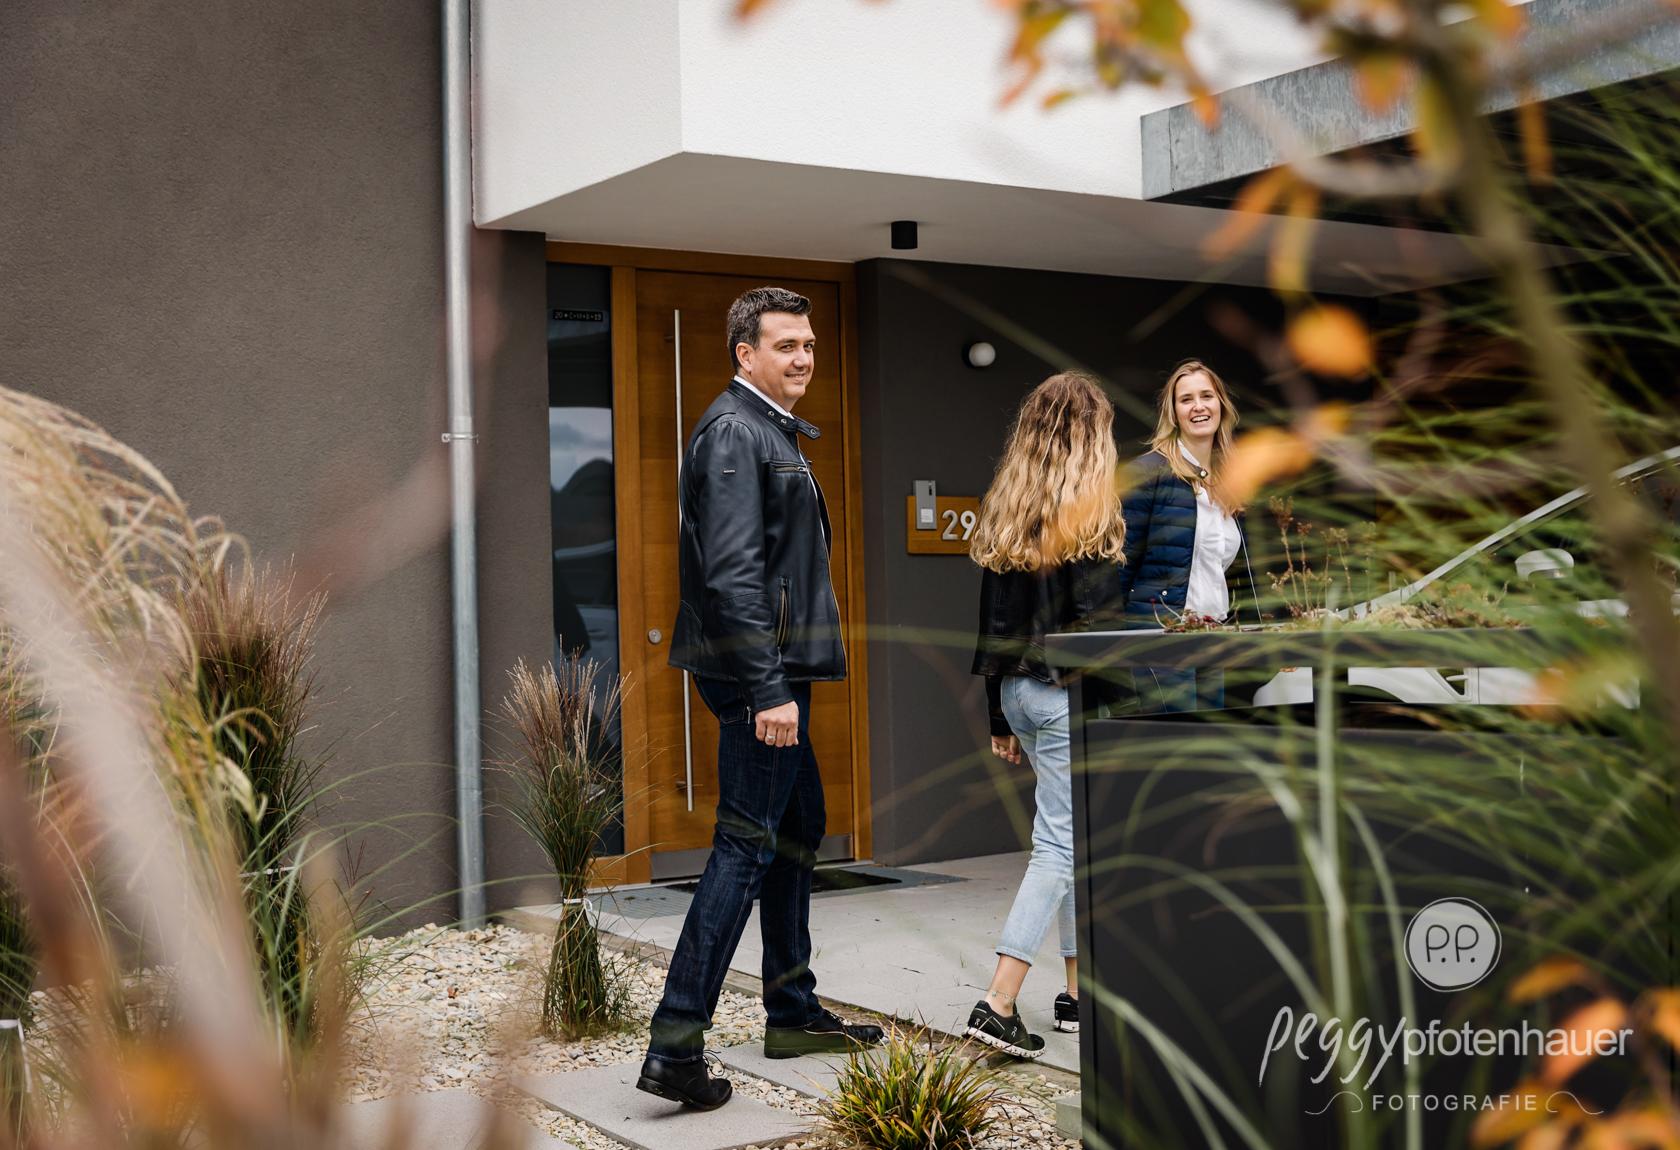 Lifestyleshooting im eigenen Haus